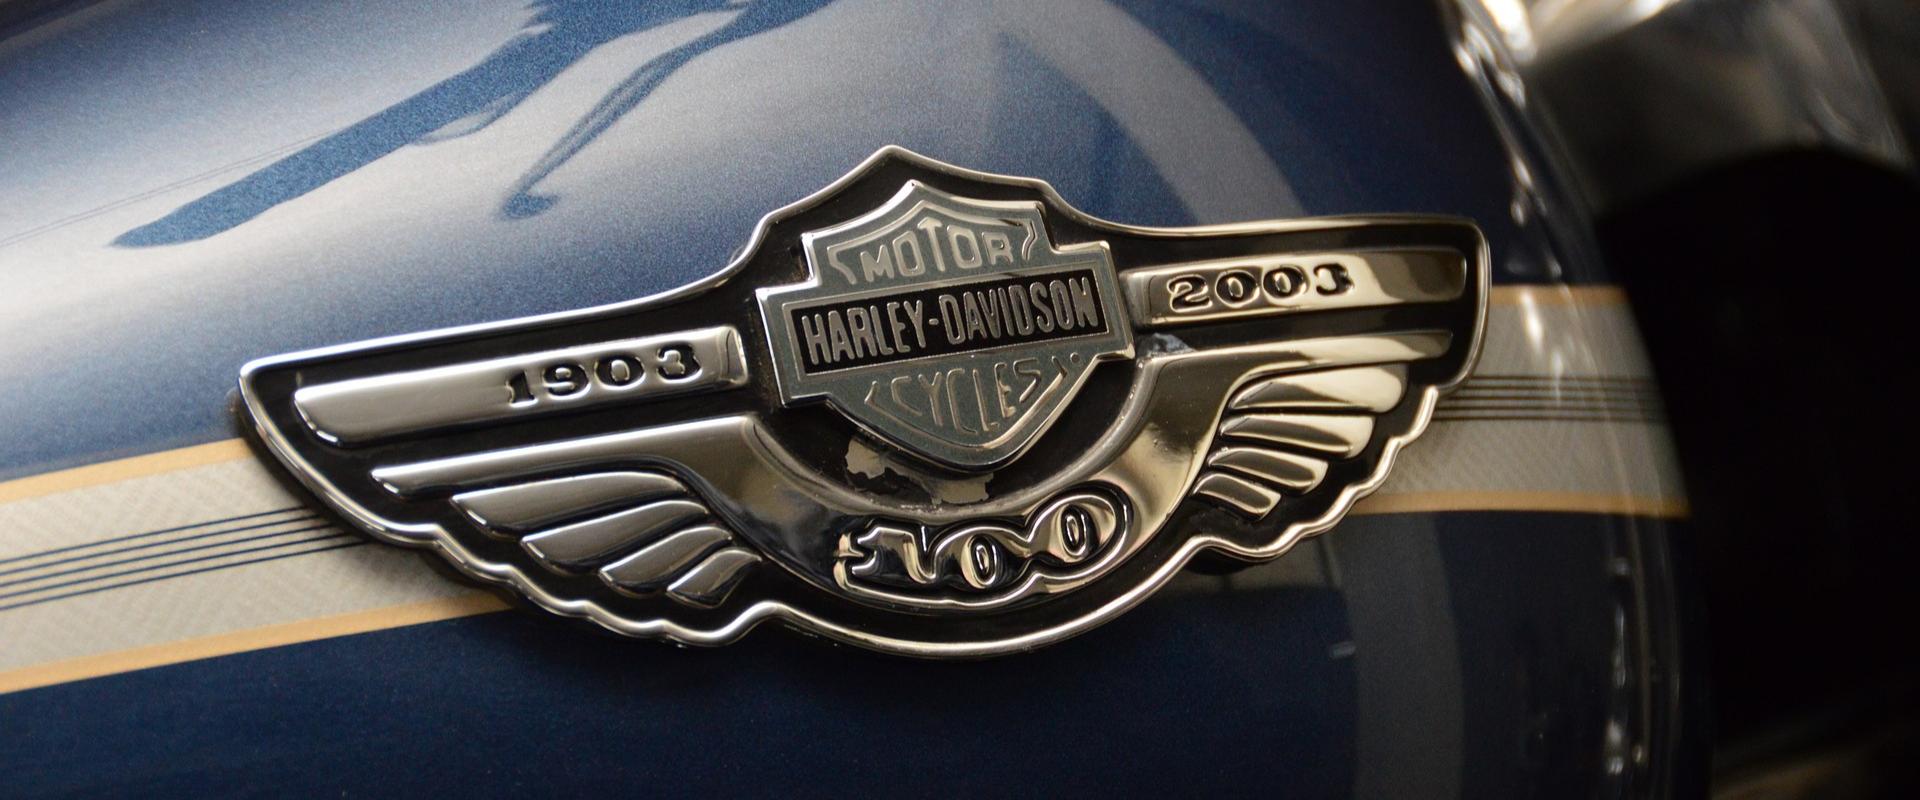 Kenai Peninsula Harley Davidson